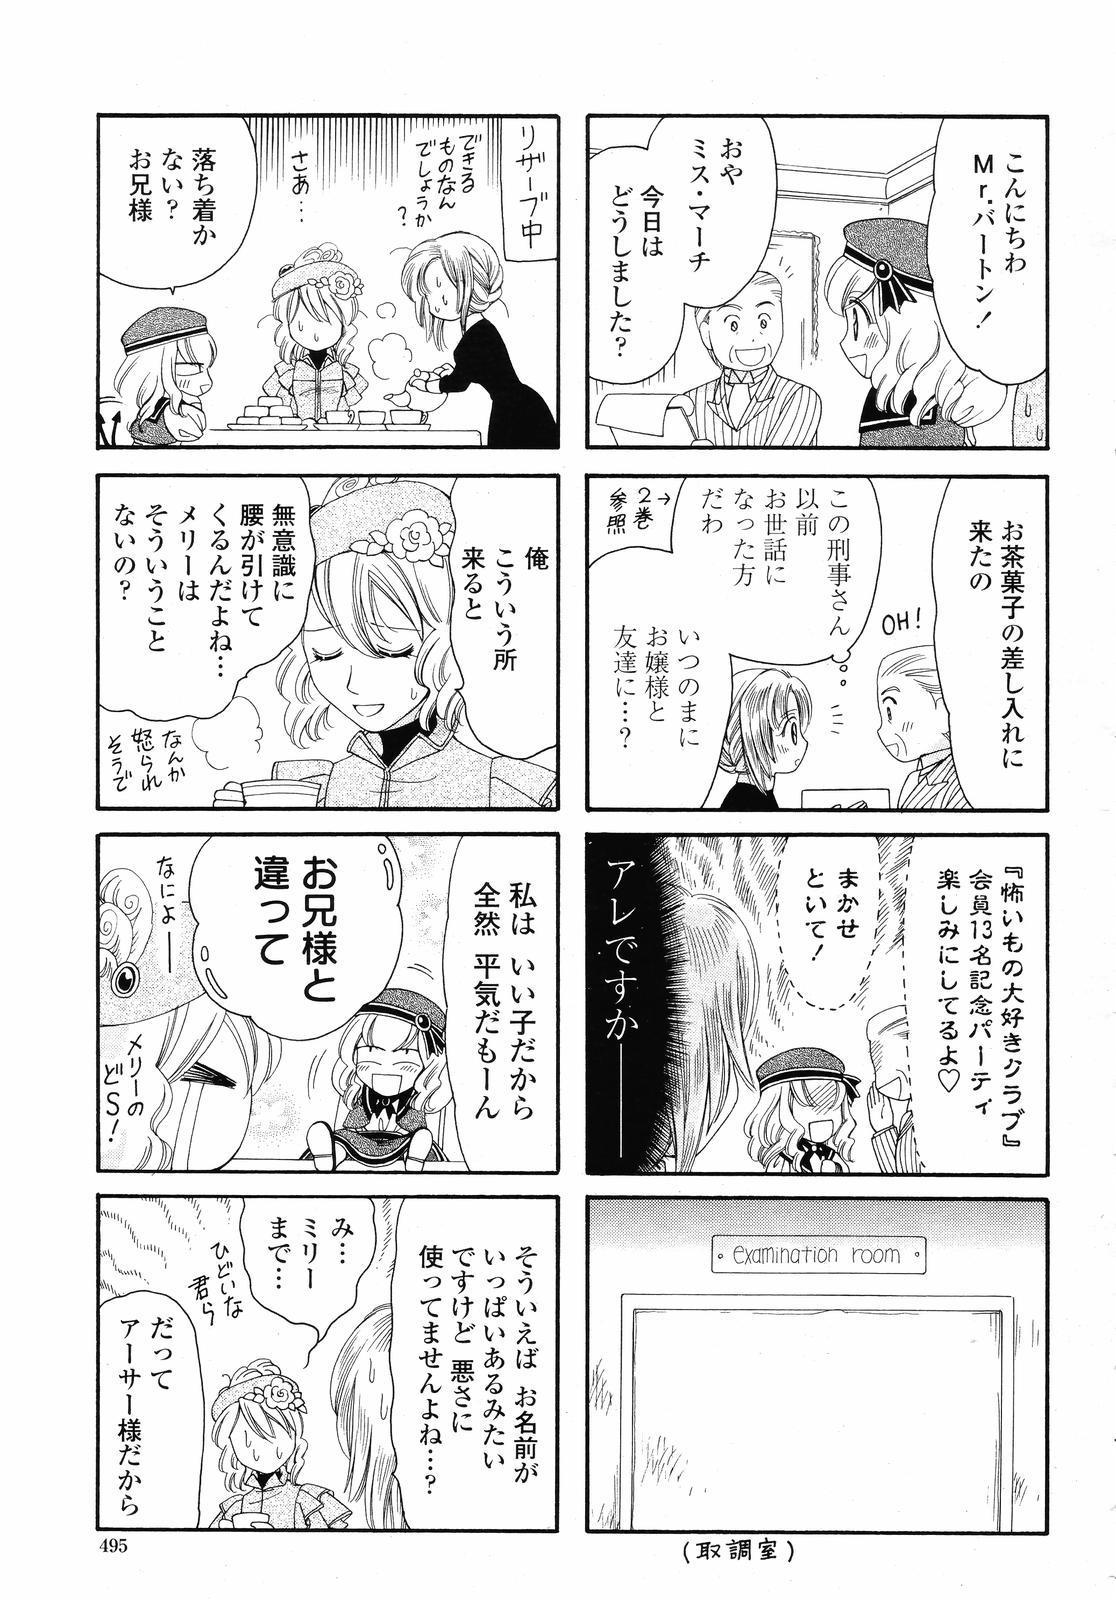 COMIC Momohime 2008-09 494